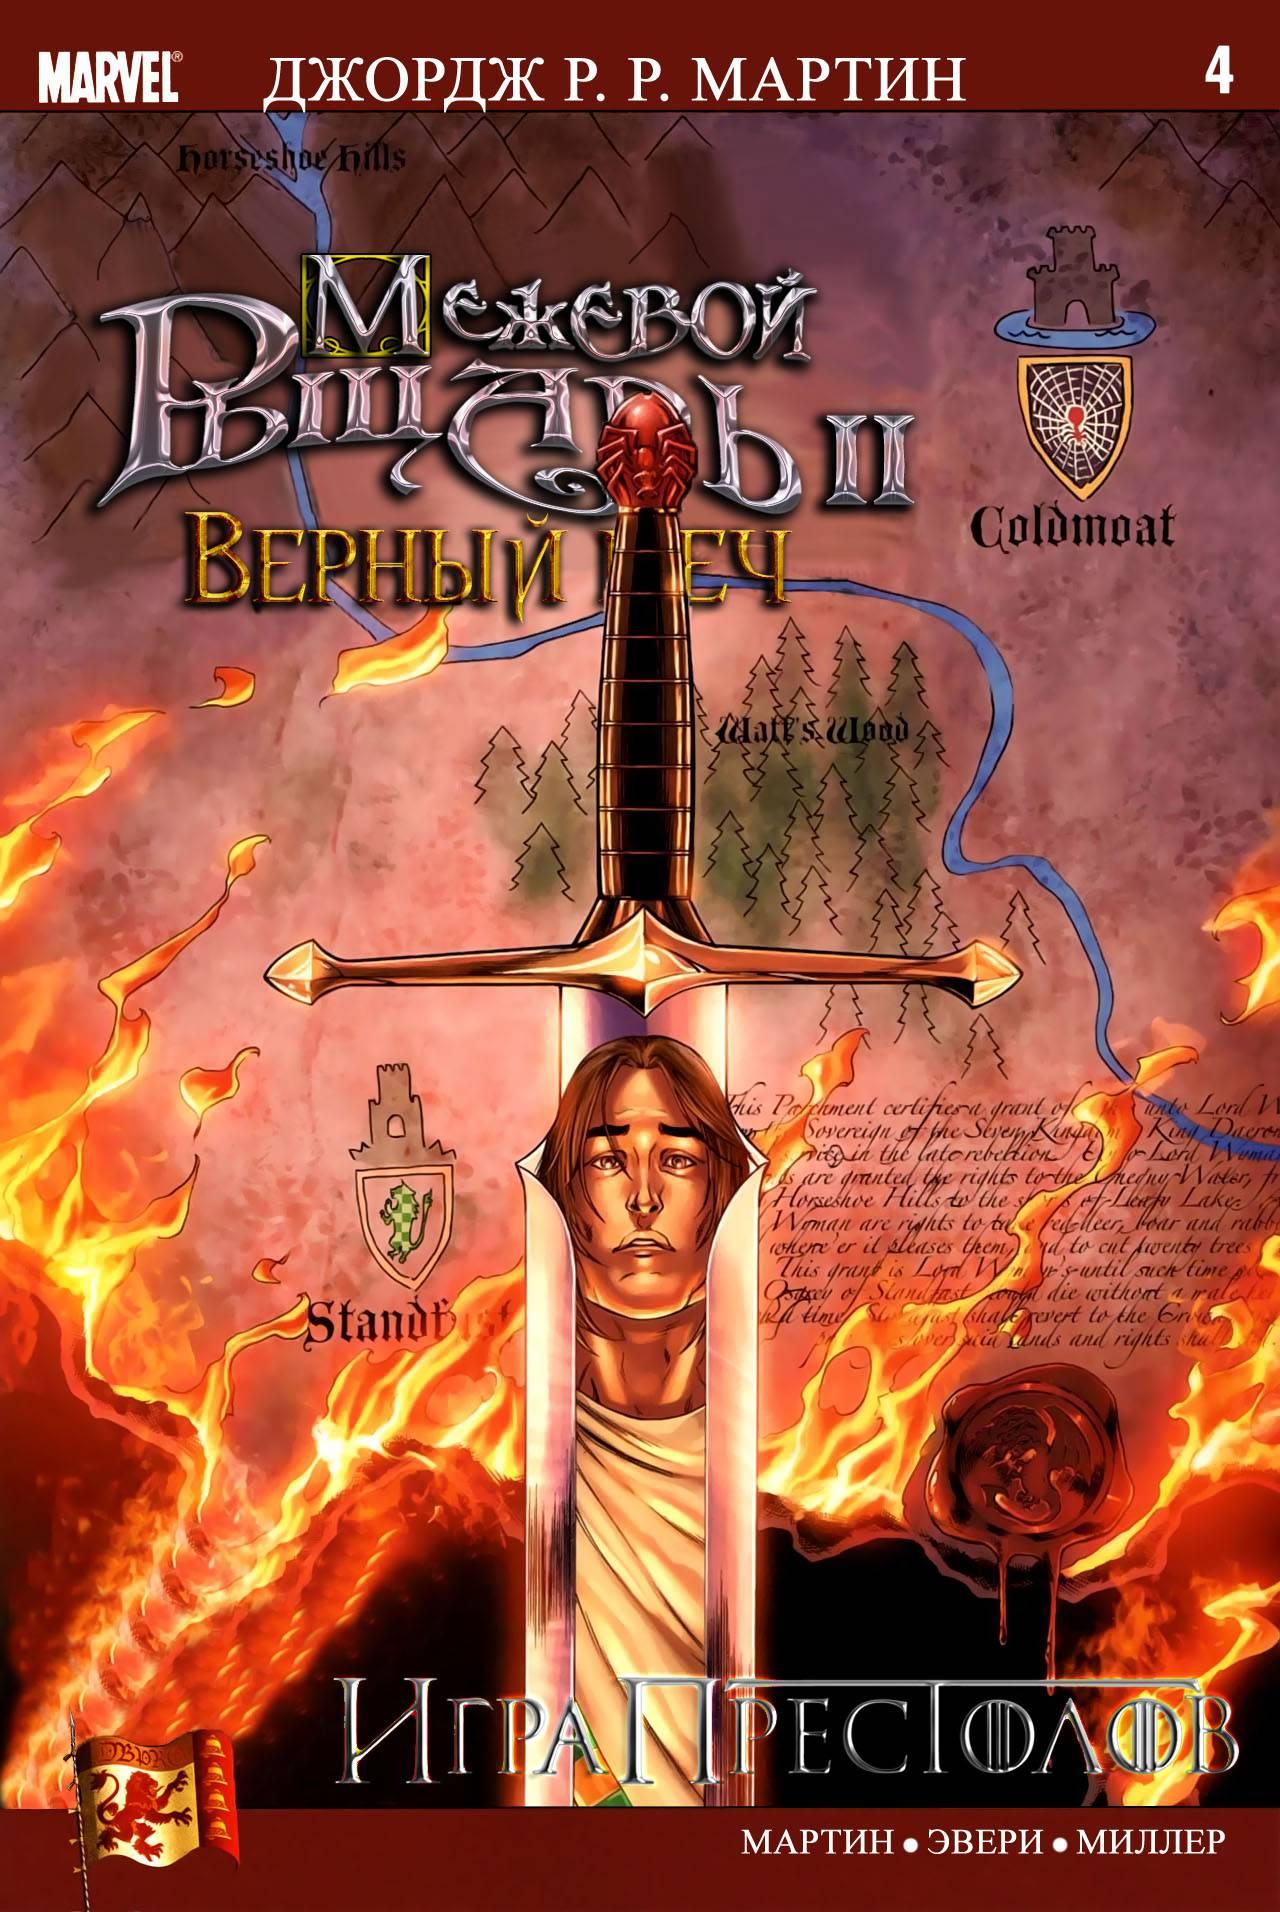 Межевой Рыцарь II: Верный Меч №4 онлайн